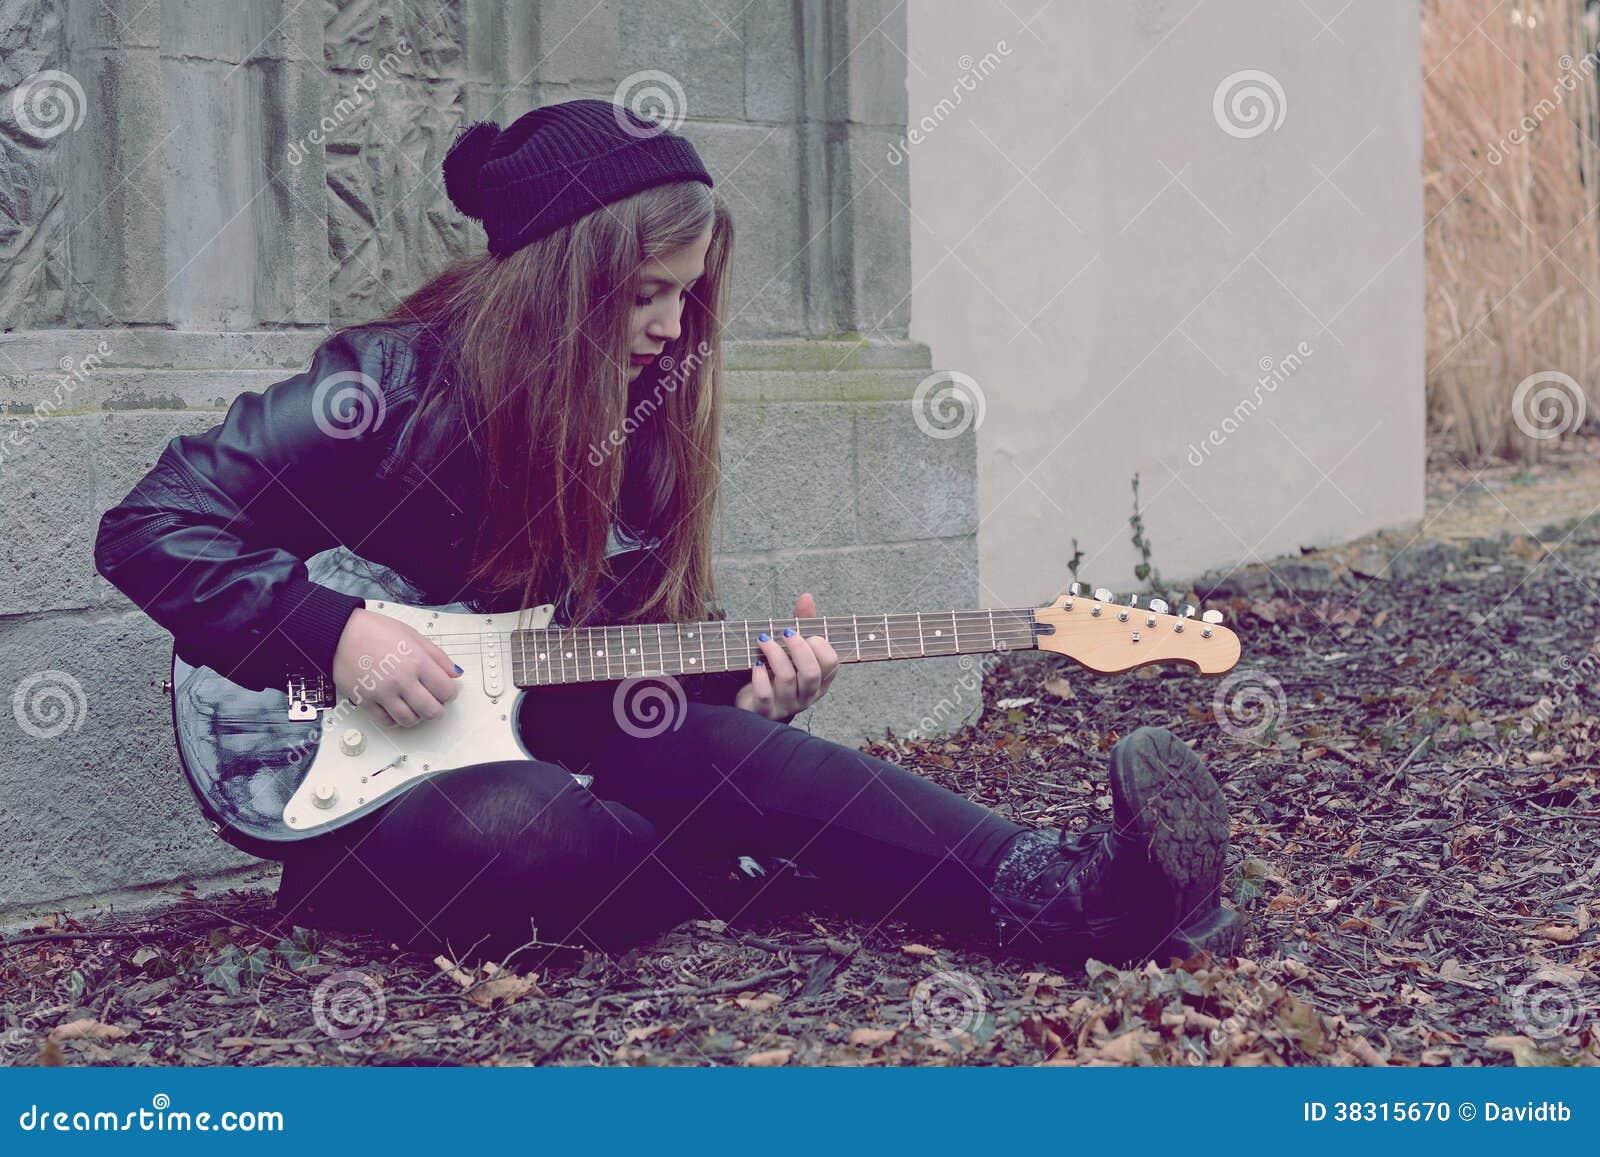 Sad girl with electric guitar